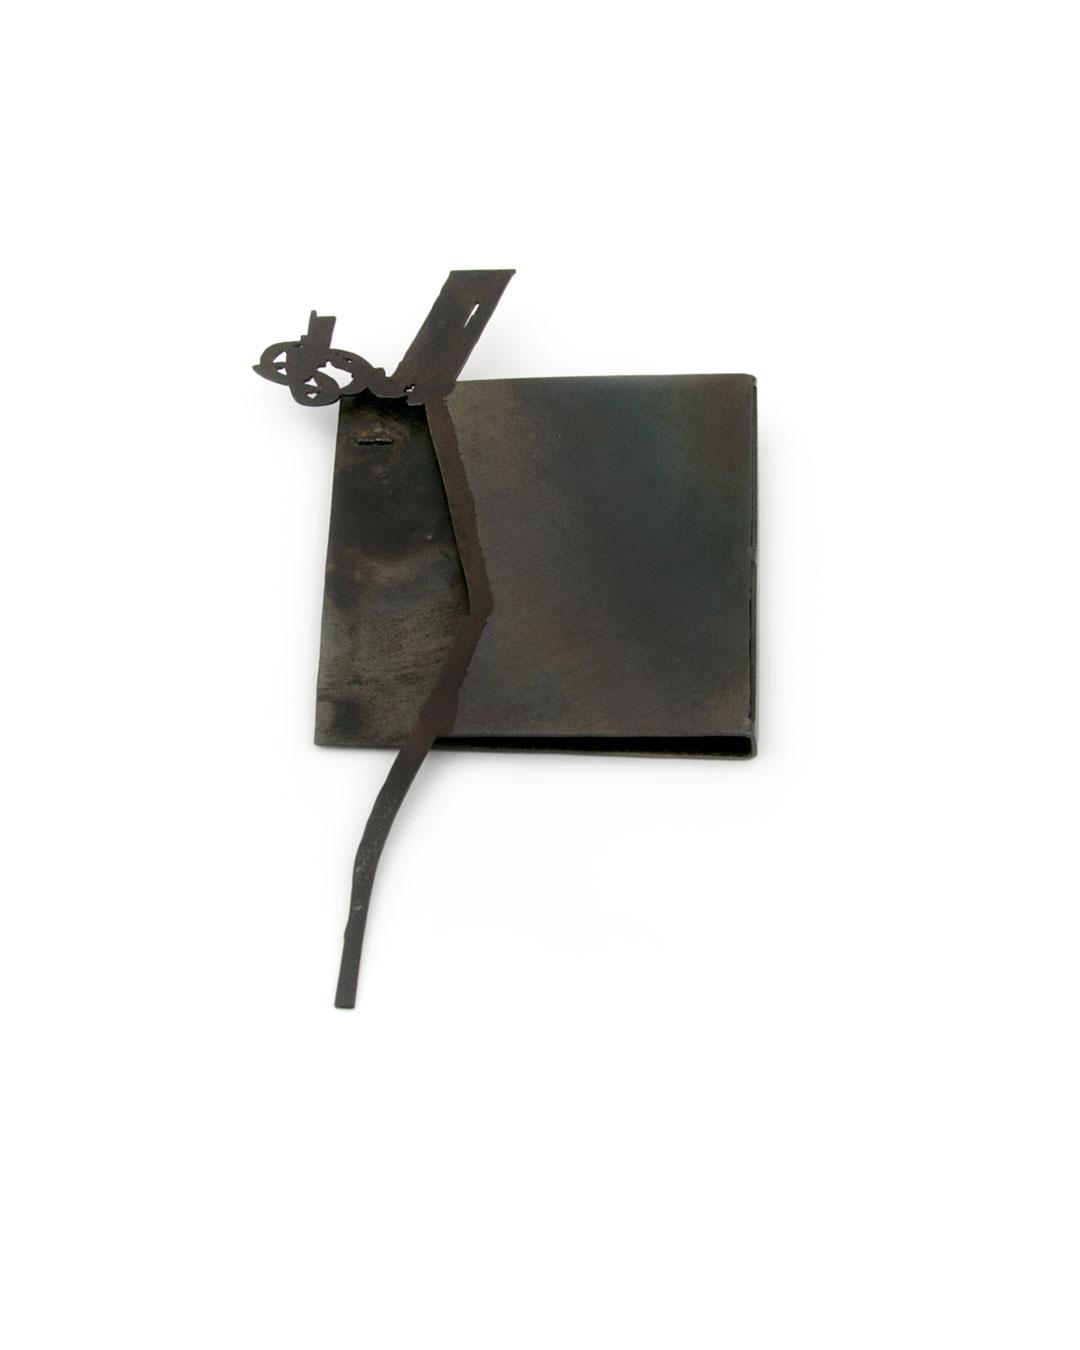 Dongchun Lee, untitled, 2004, brooch; iron, 70 x 117 x 5 mm, €970